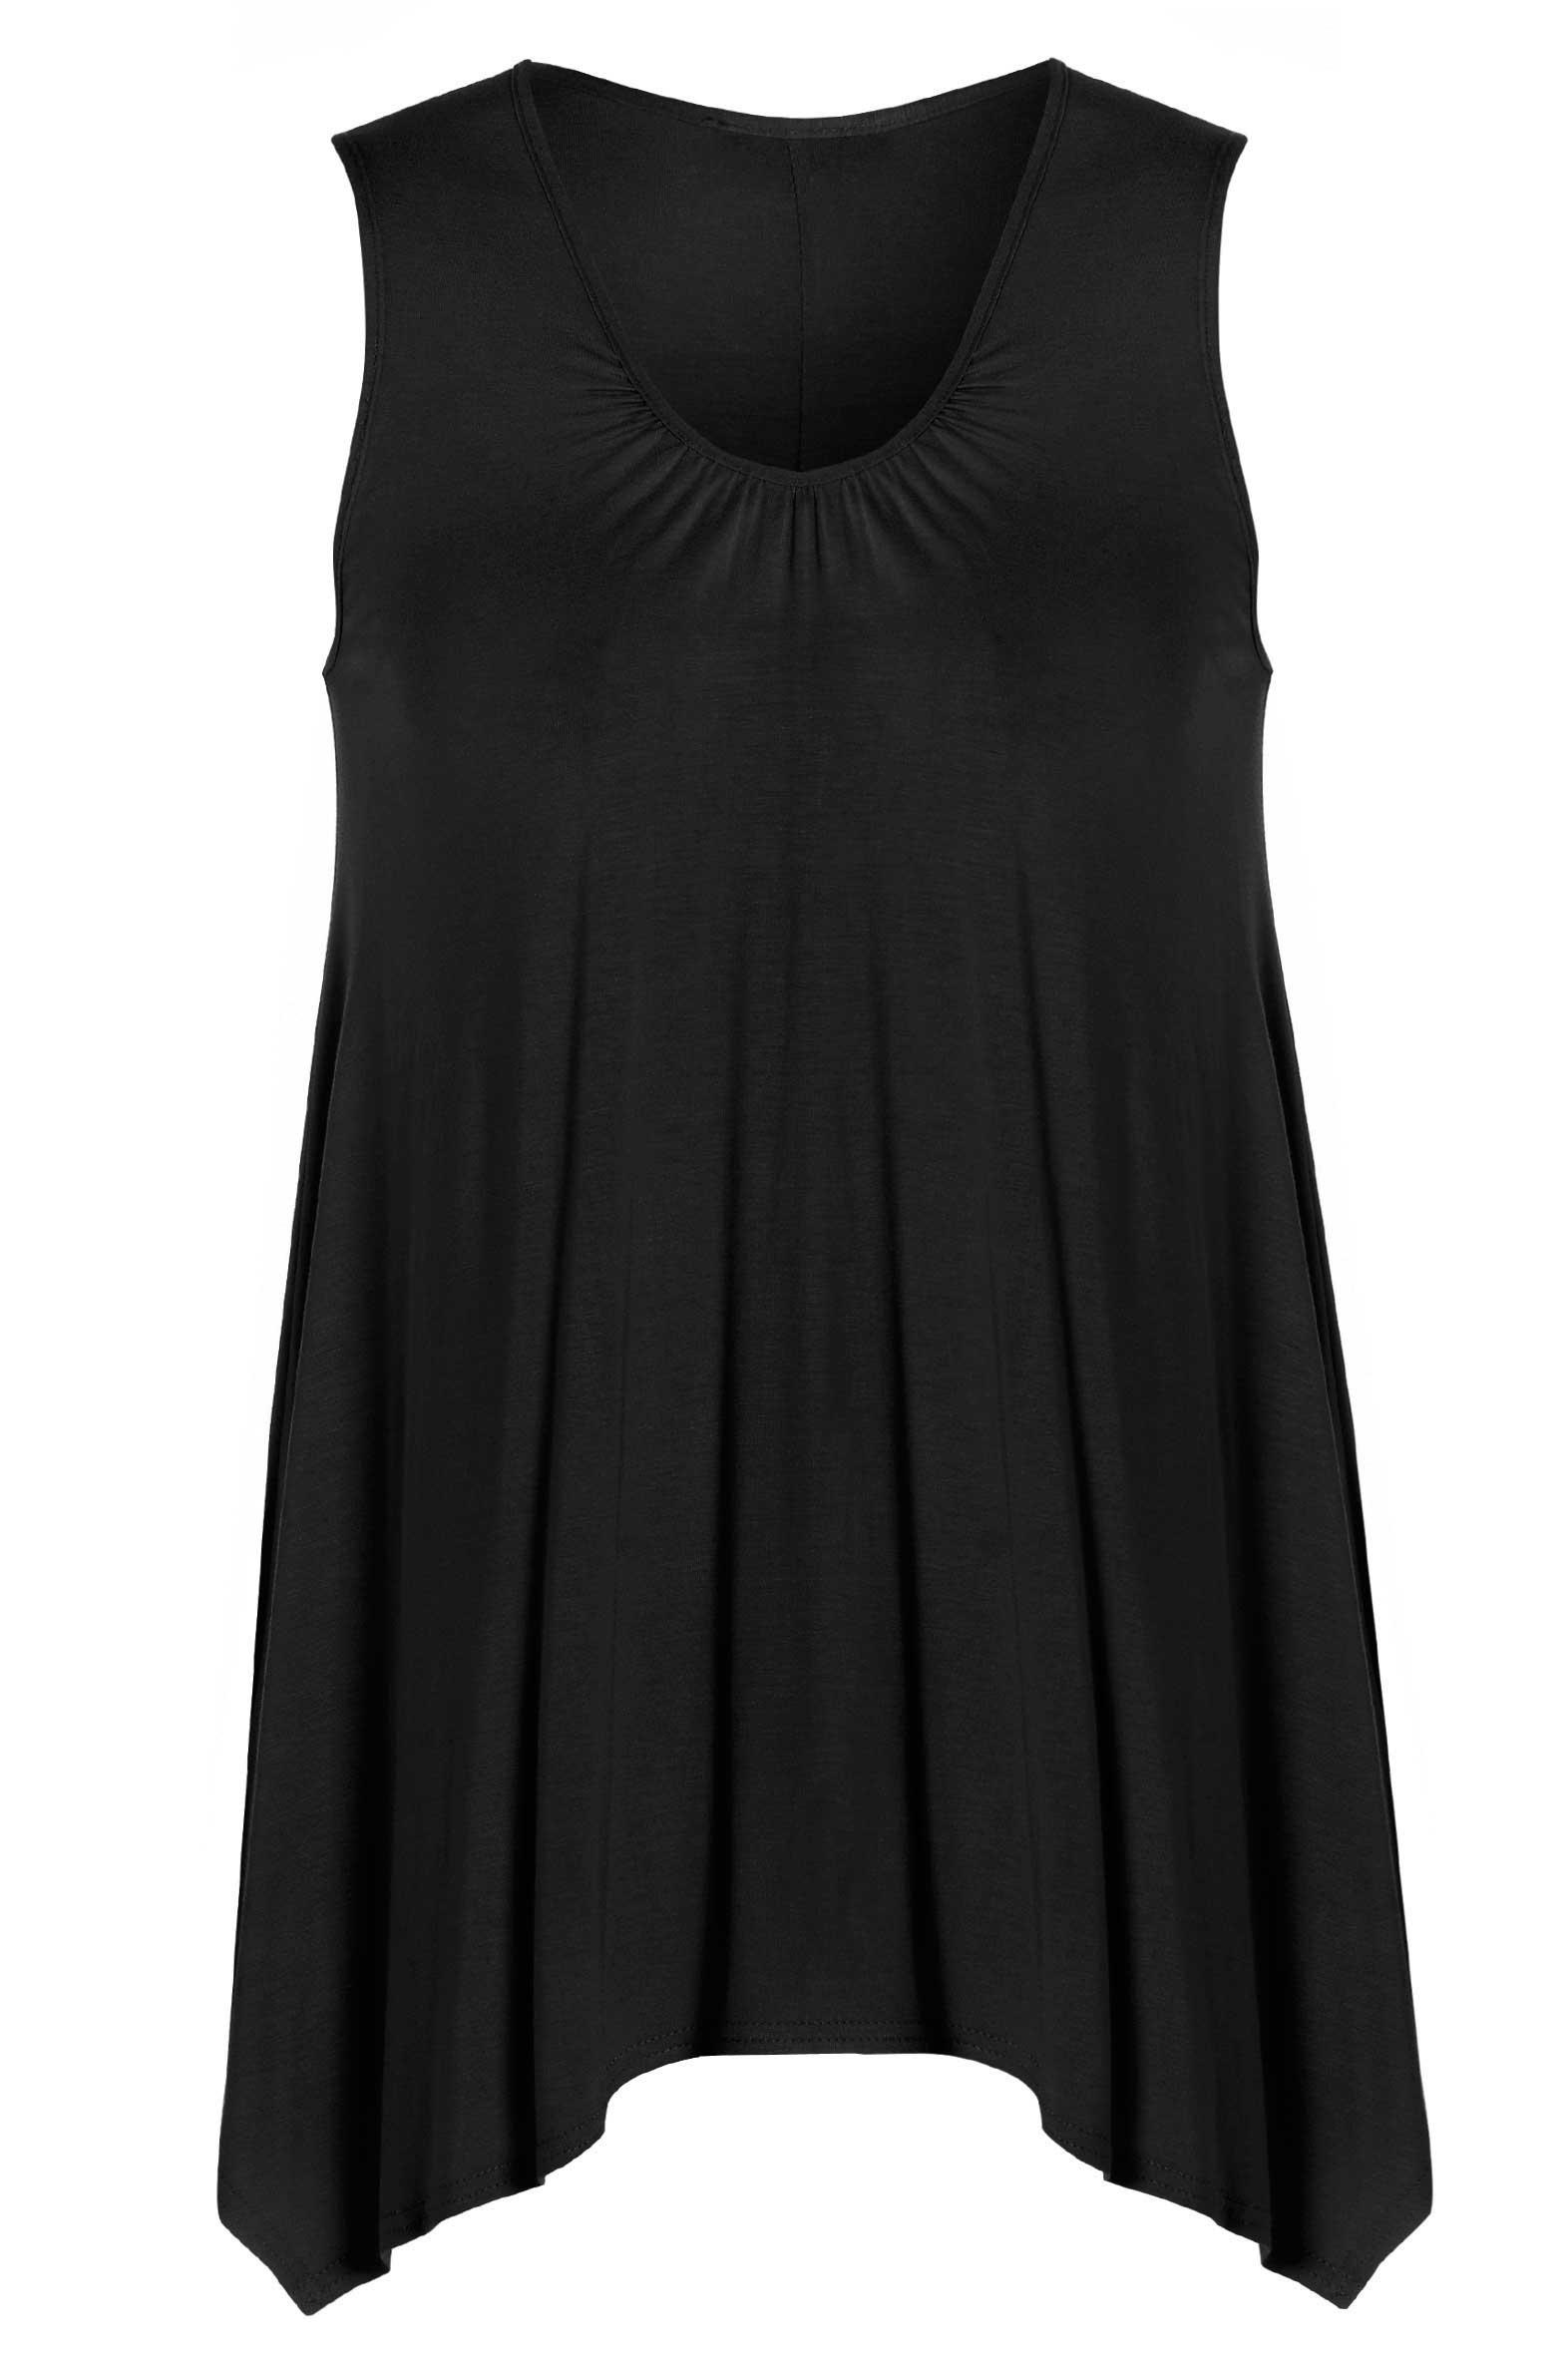 Womens Plus Size Black Sleeveless Ruched Neckline Plain